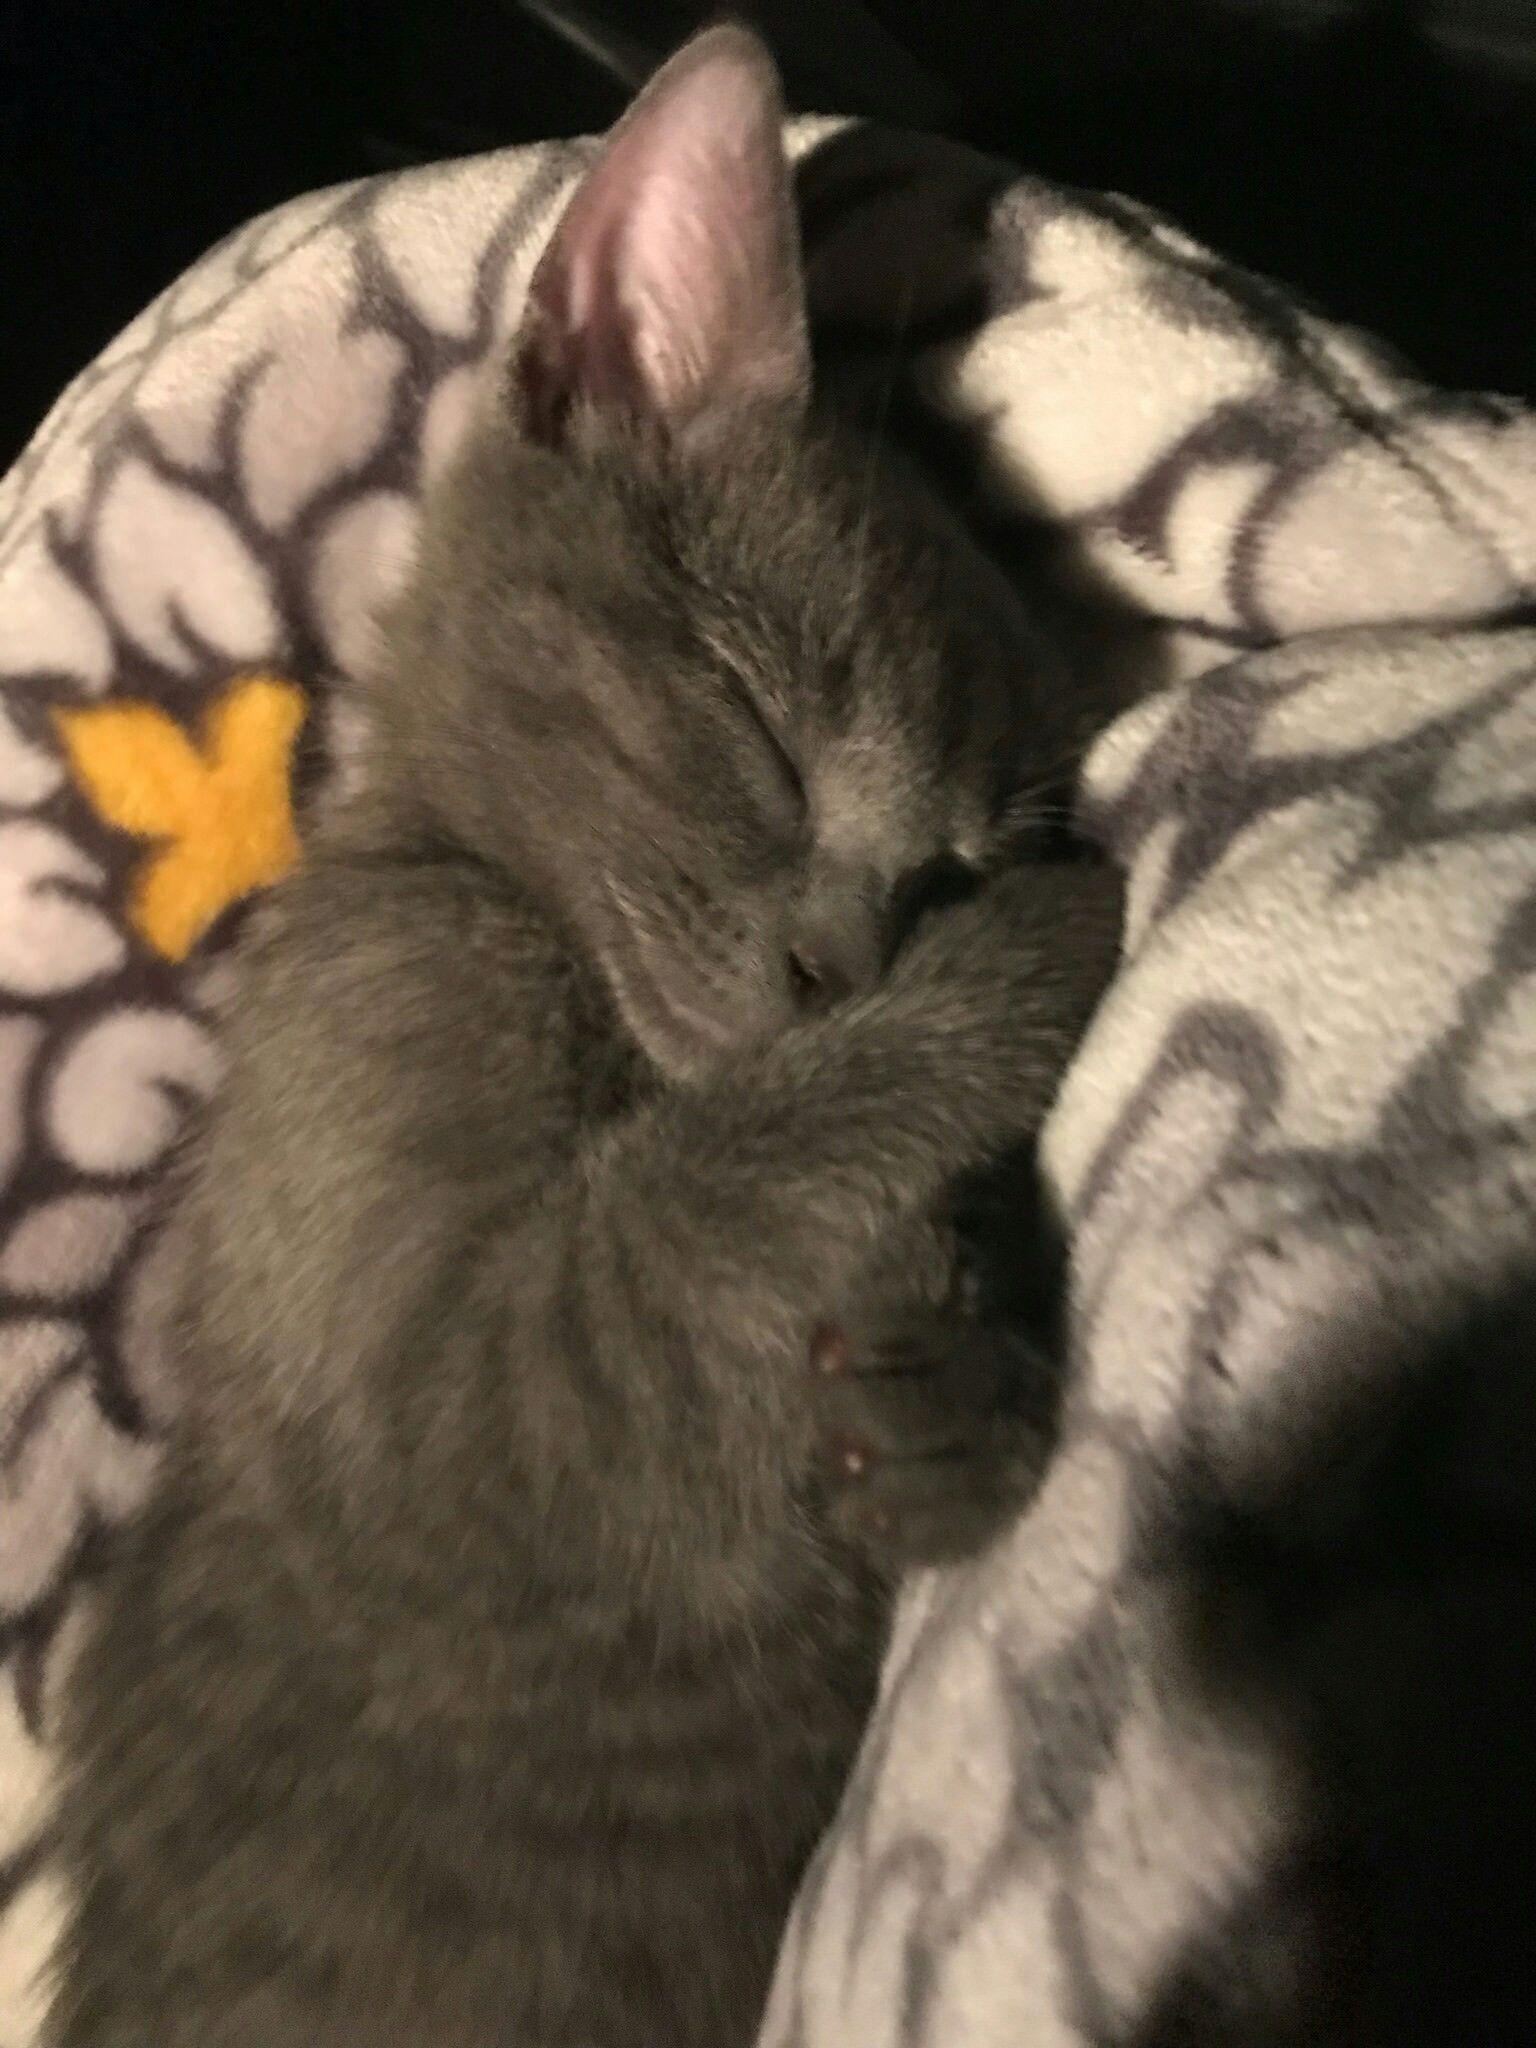 2 Month Old Kitten Sleeping Like A Human Http Ift Tt 2j9cekr Sleeping Kitten Kittens Cat Nap